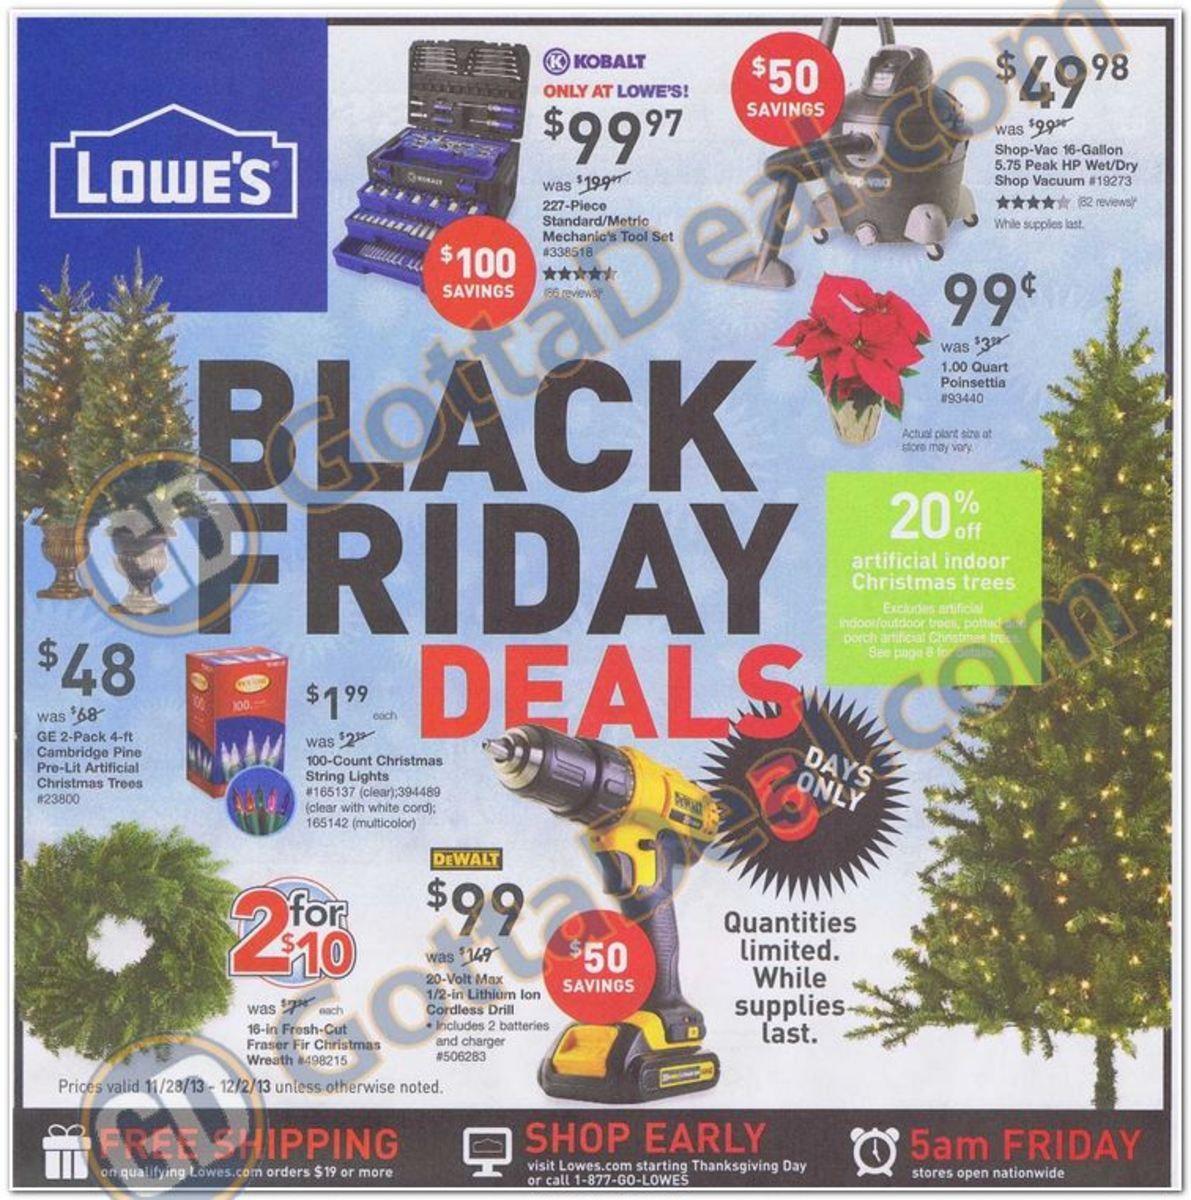 Lowe's Black Friday Ad 2013 Black friday ads, Black